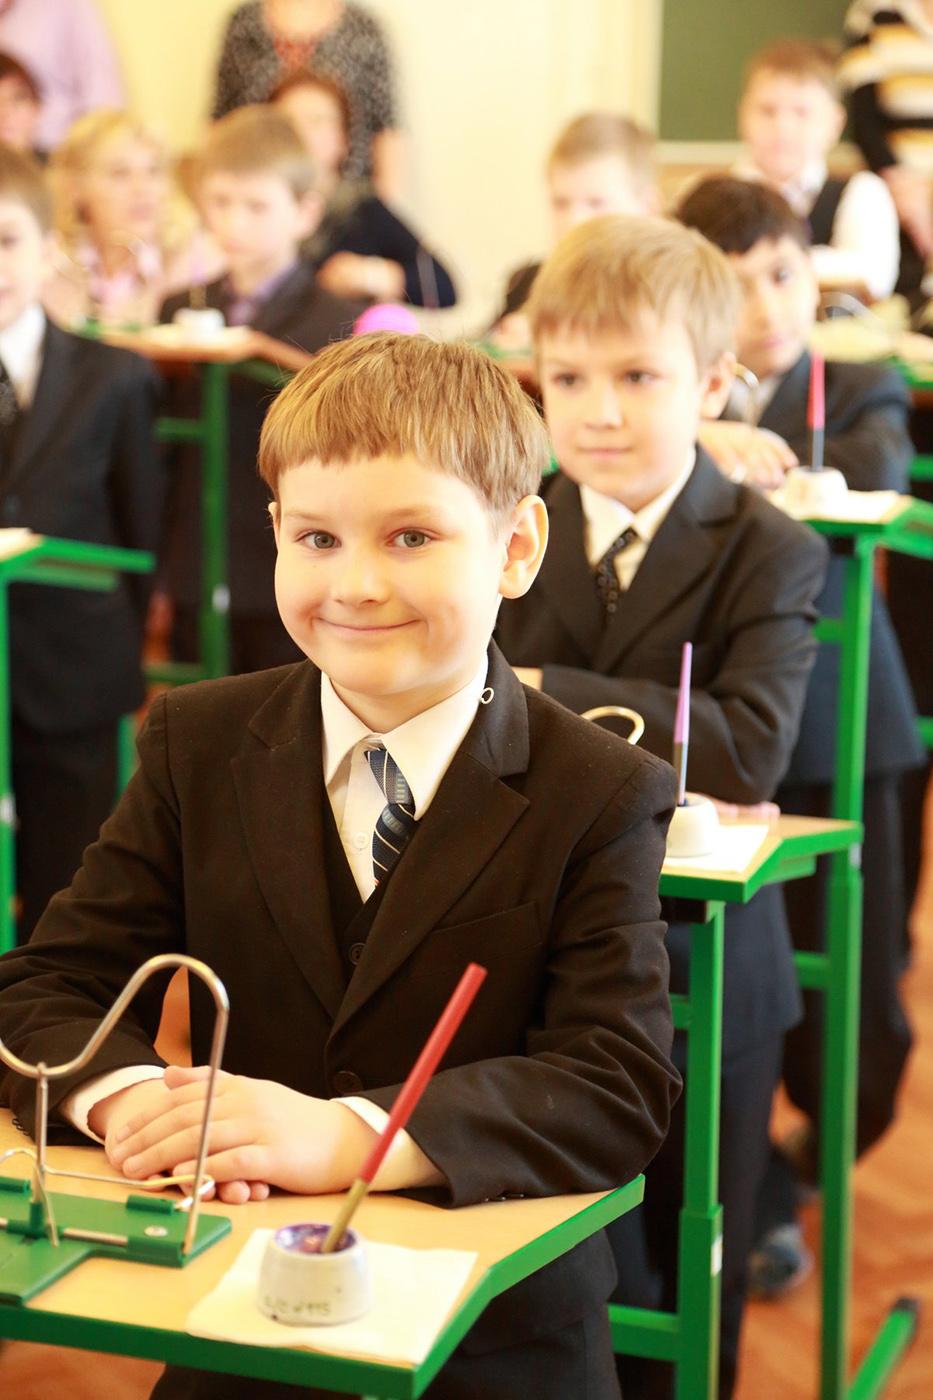 Фото дети в классе за партами